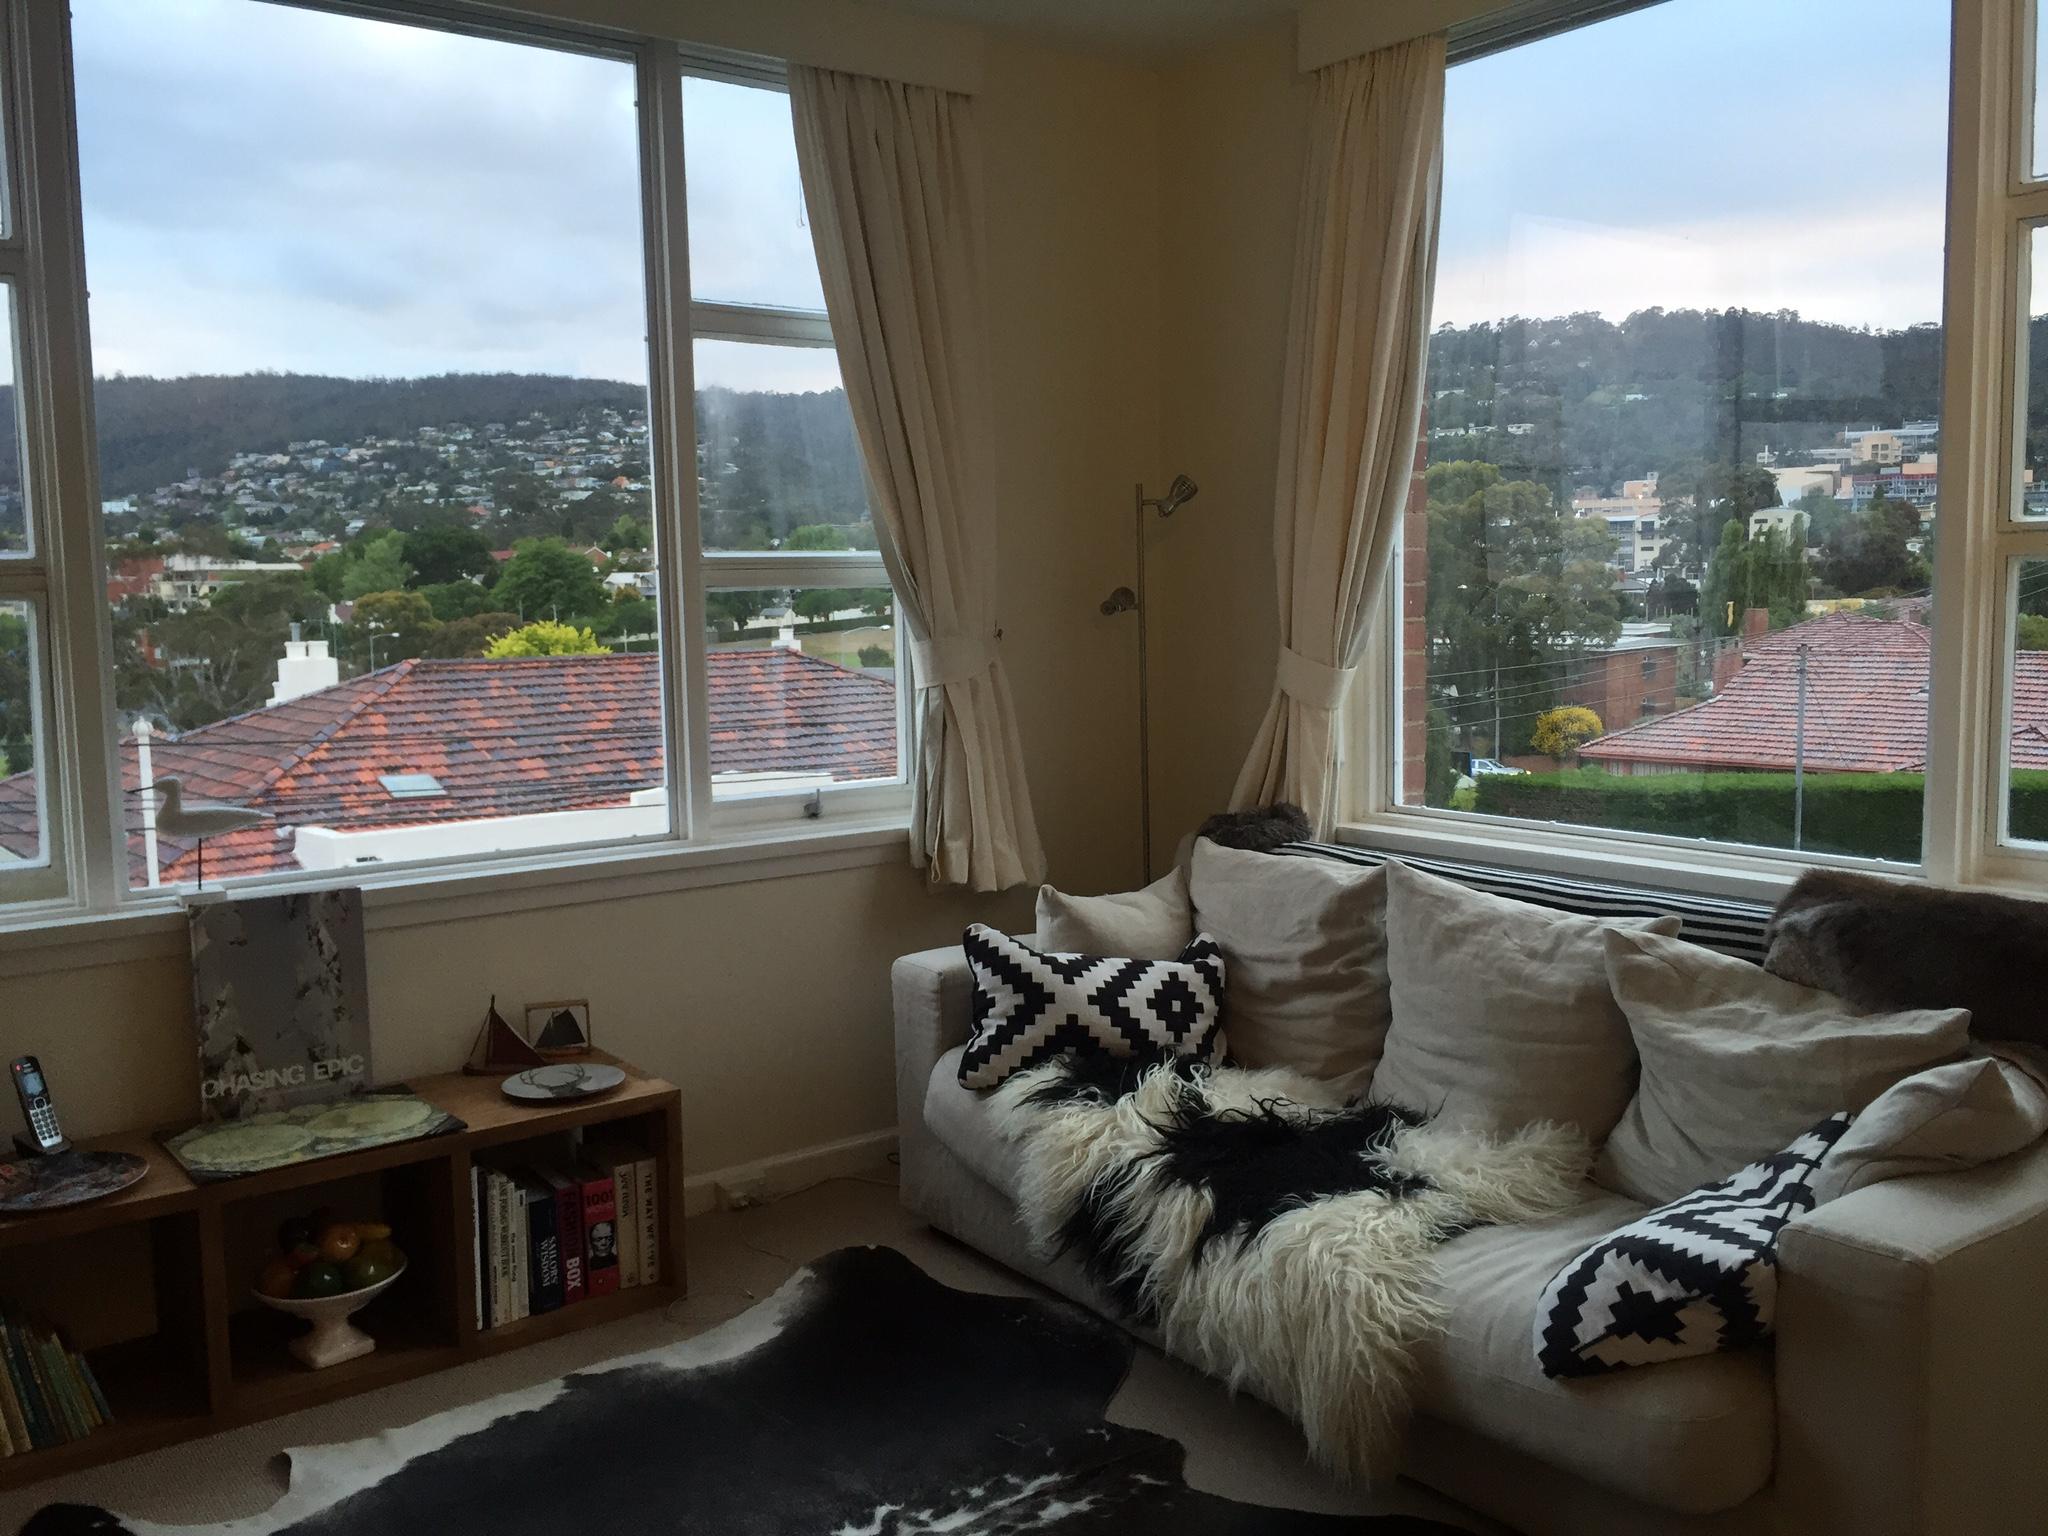 Our Airbnb flat in Hobart, Tasmania